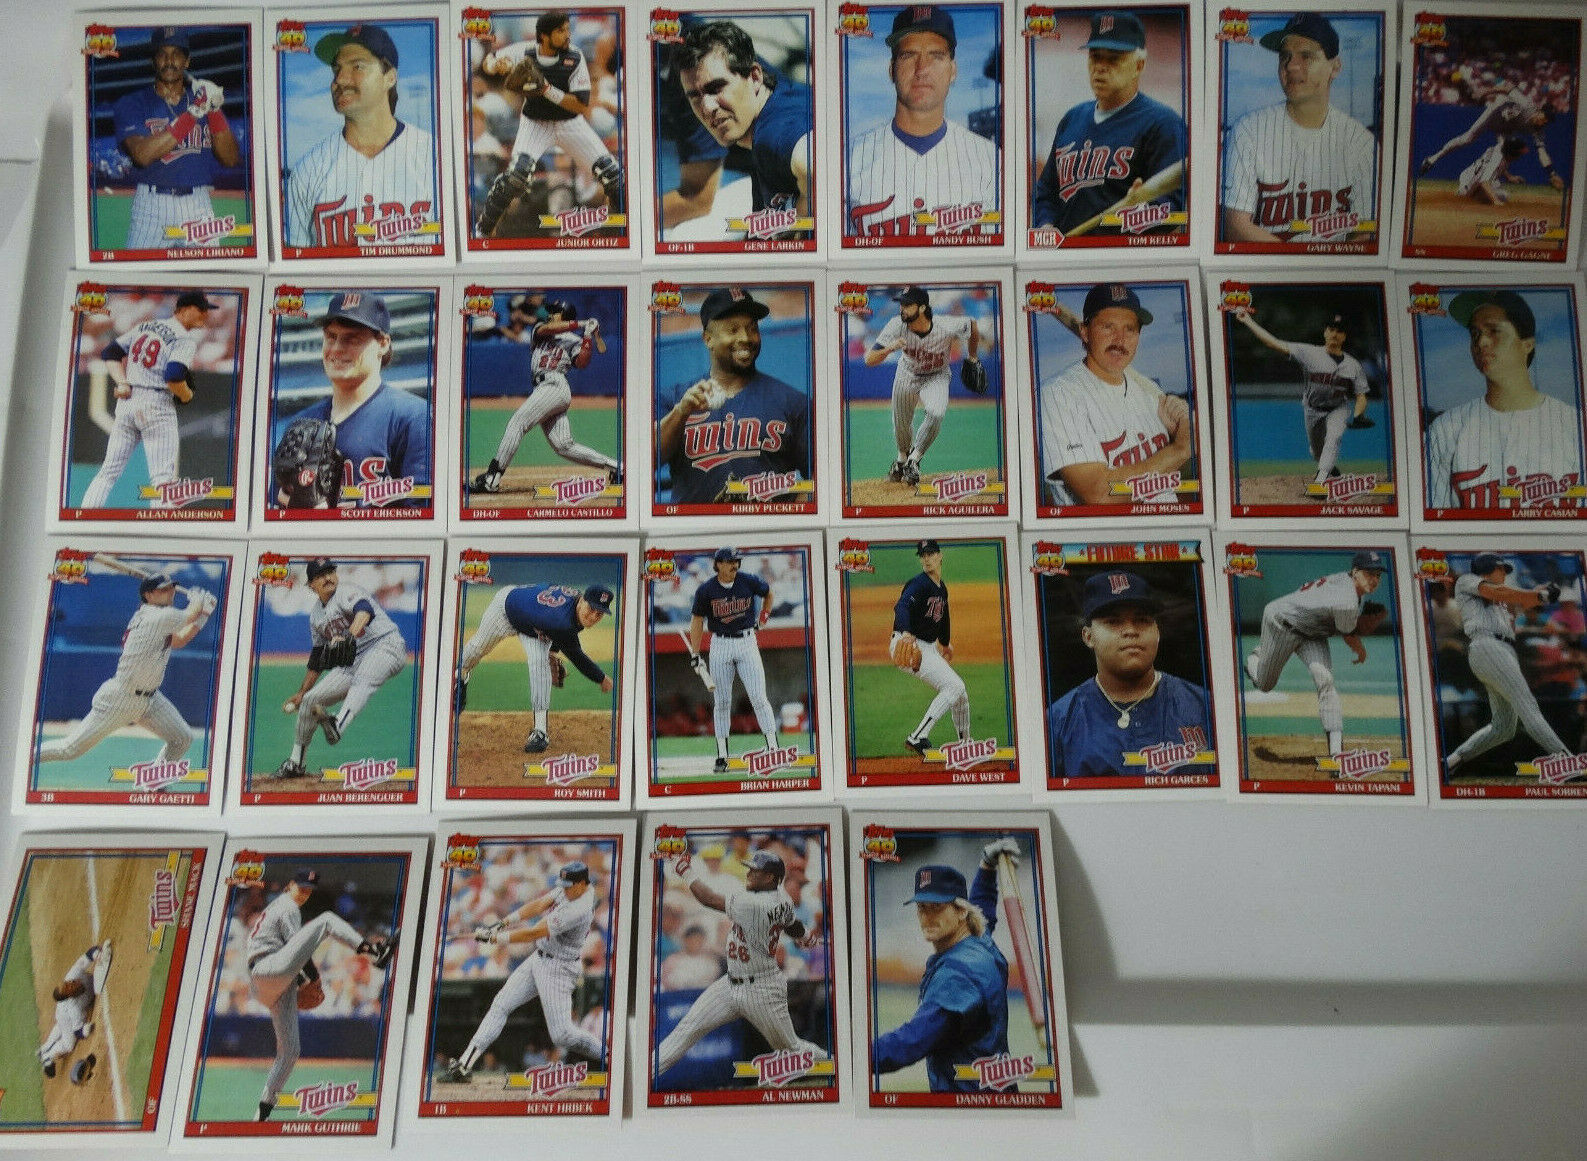 1991 Topps Minnesota Twins Team Set of 29 Baseball Cards